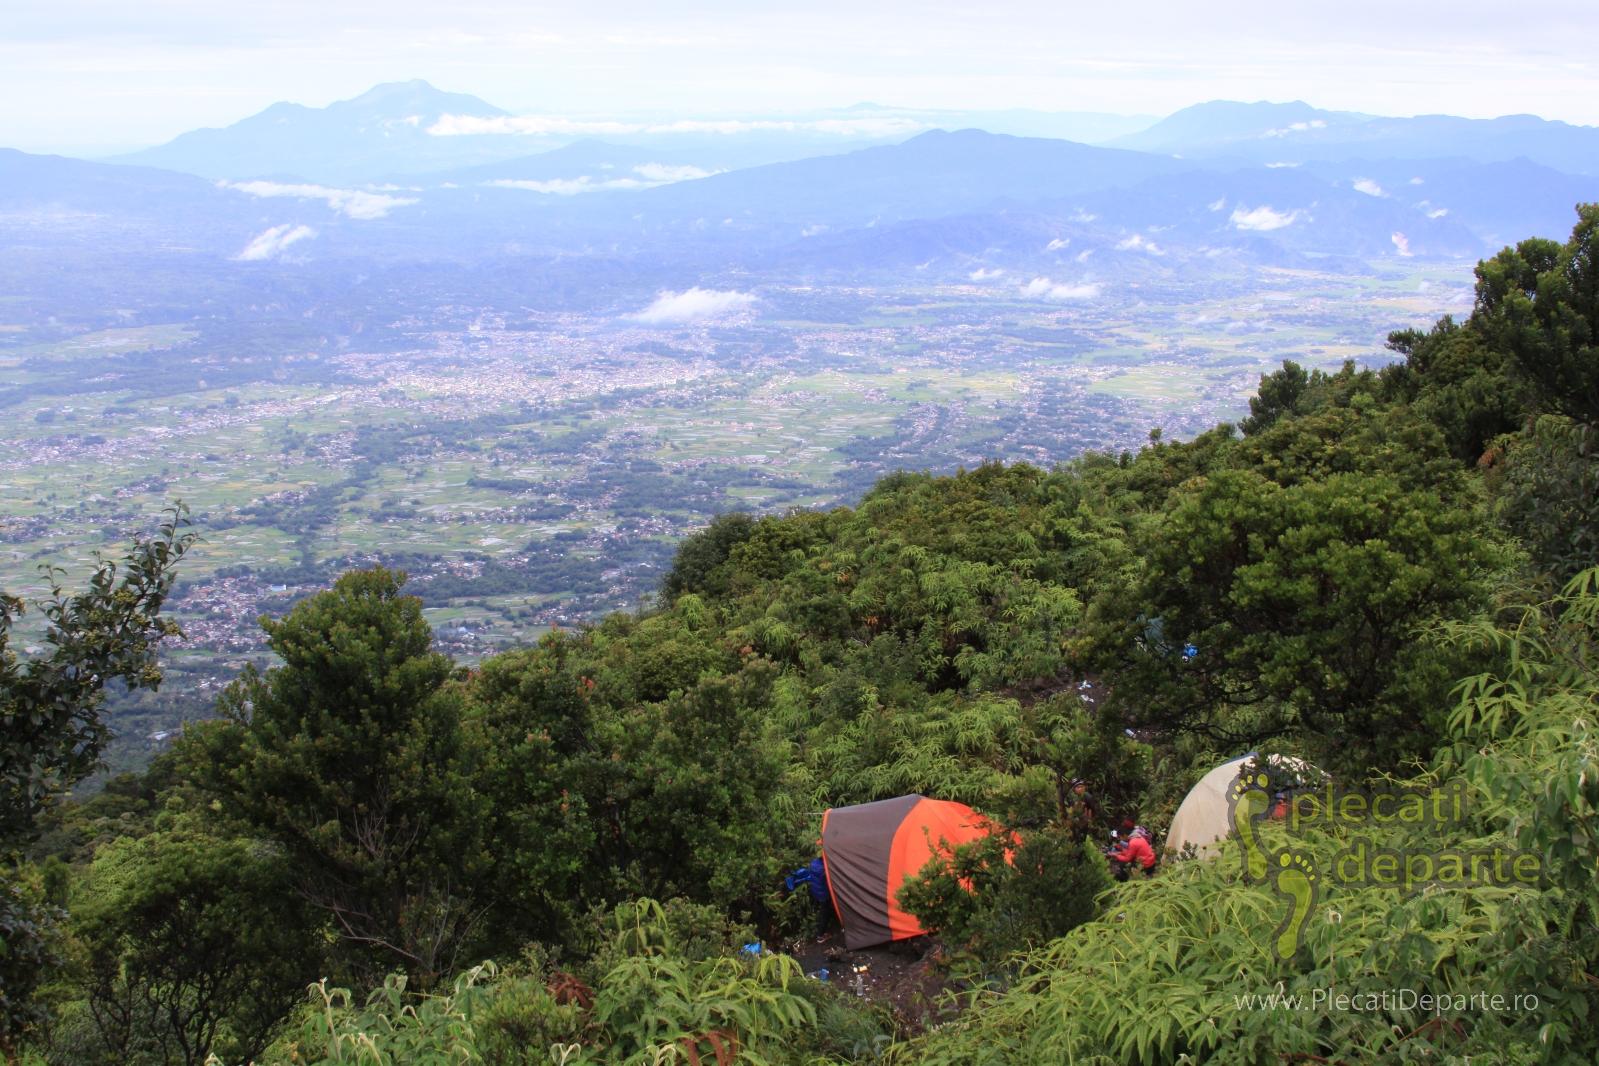 Camping pe vulcanul Gunung Marapi, Sumatra, Indonezia, 2.891m